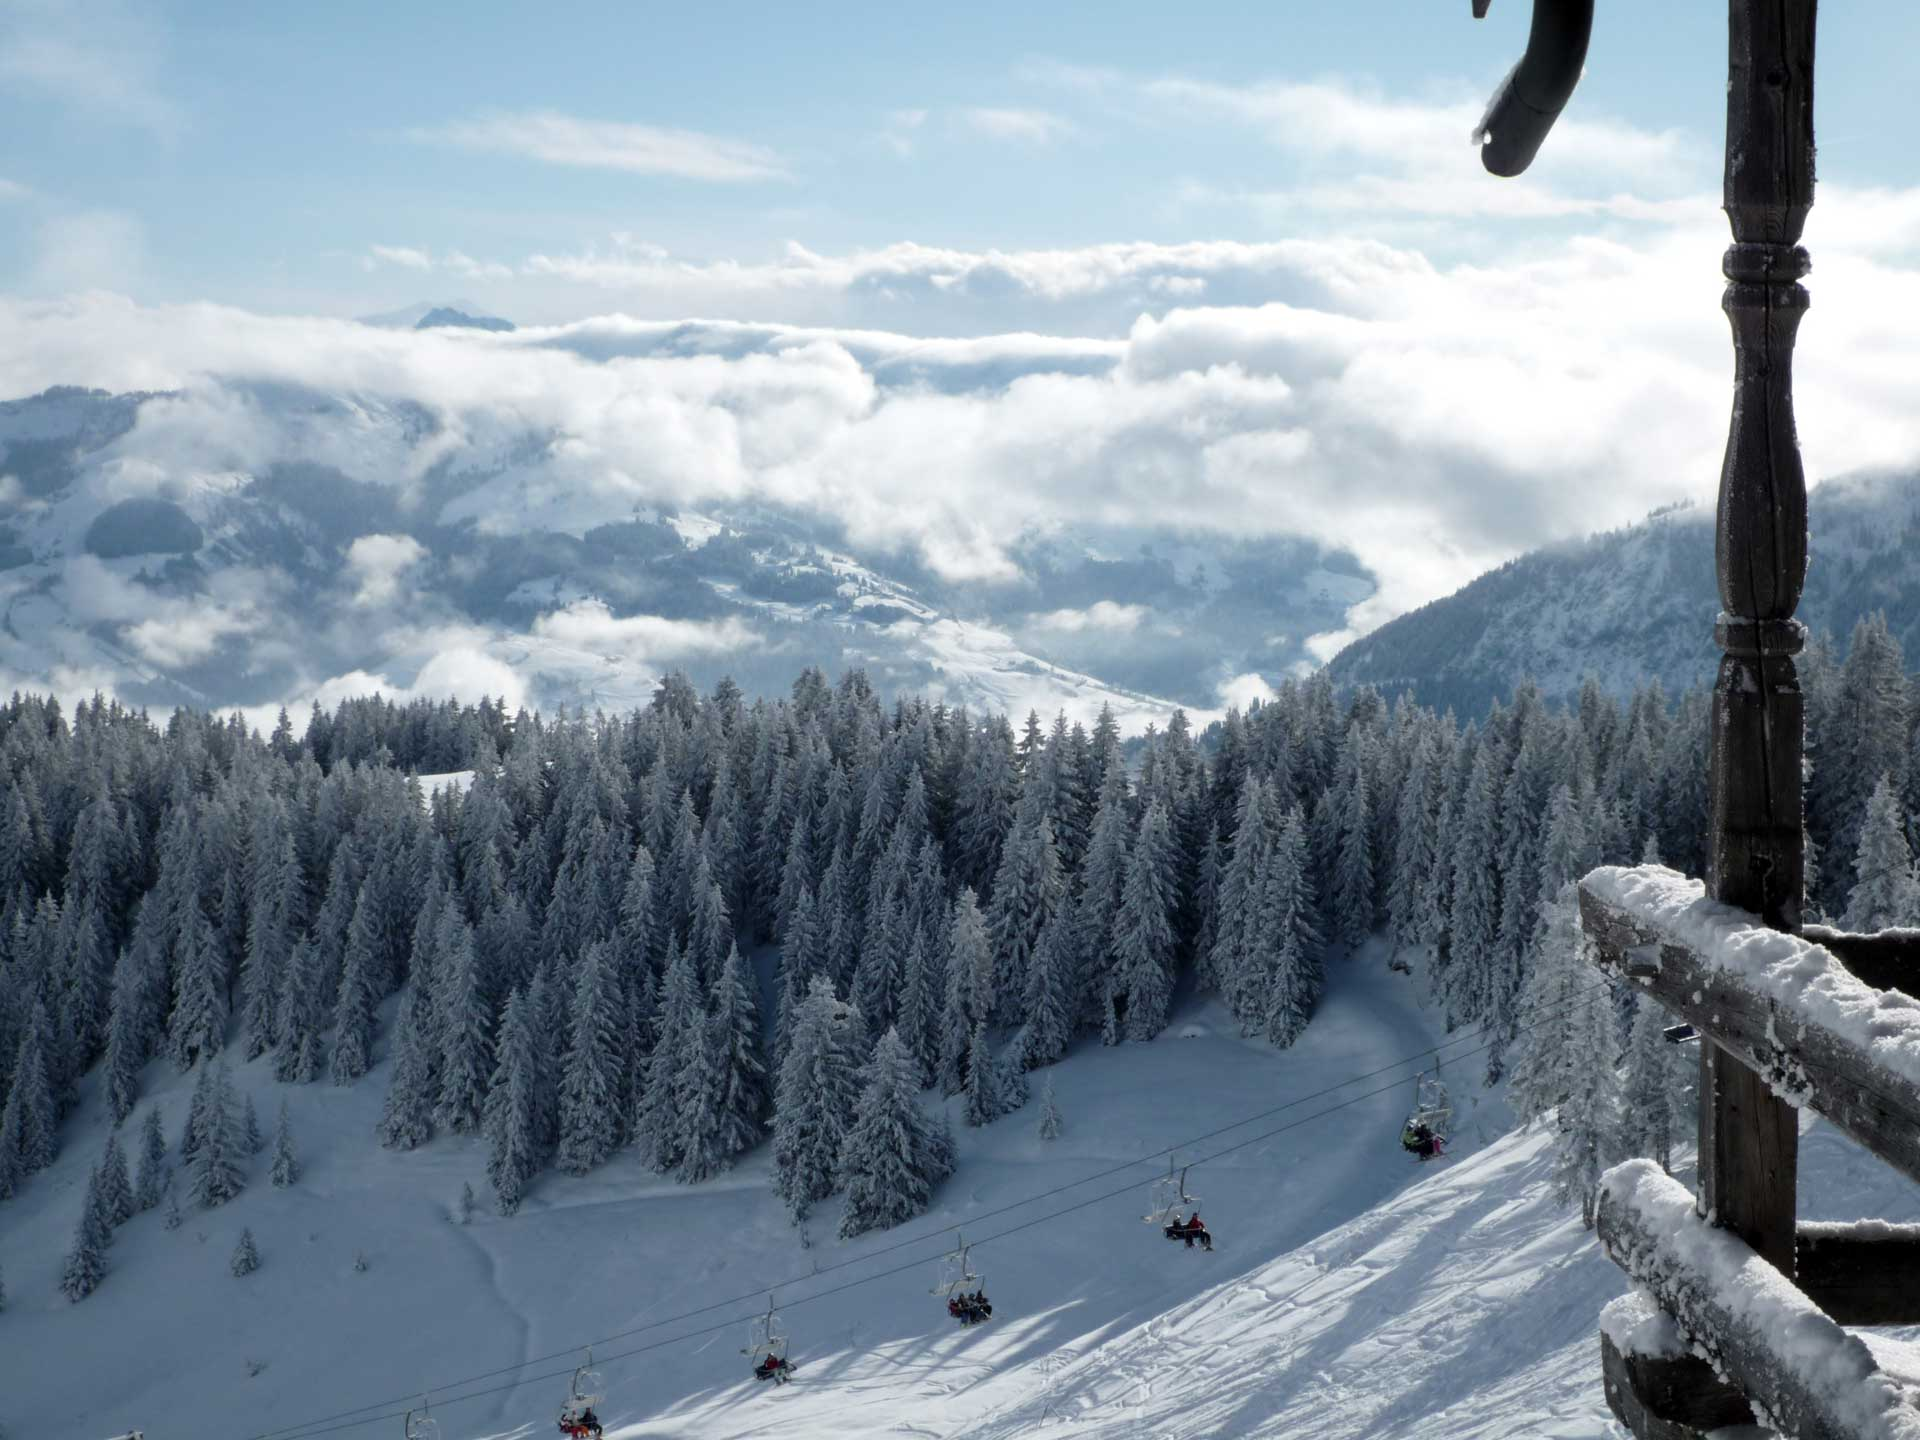 zweisimmen - swiss ski resort | j2ski